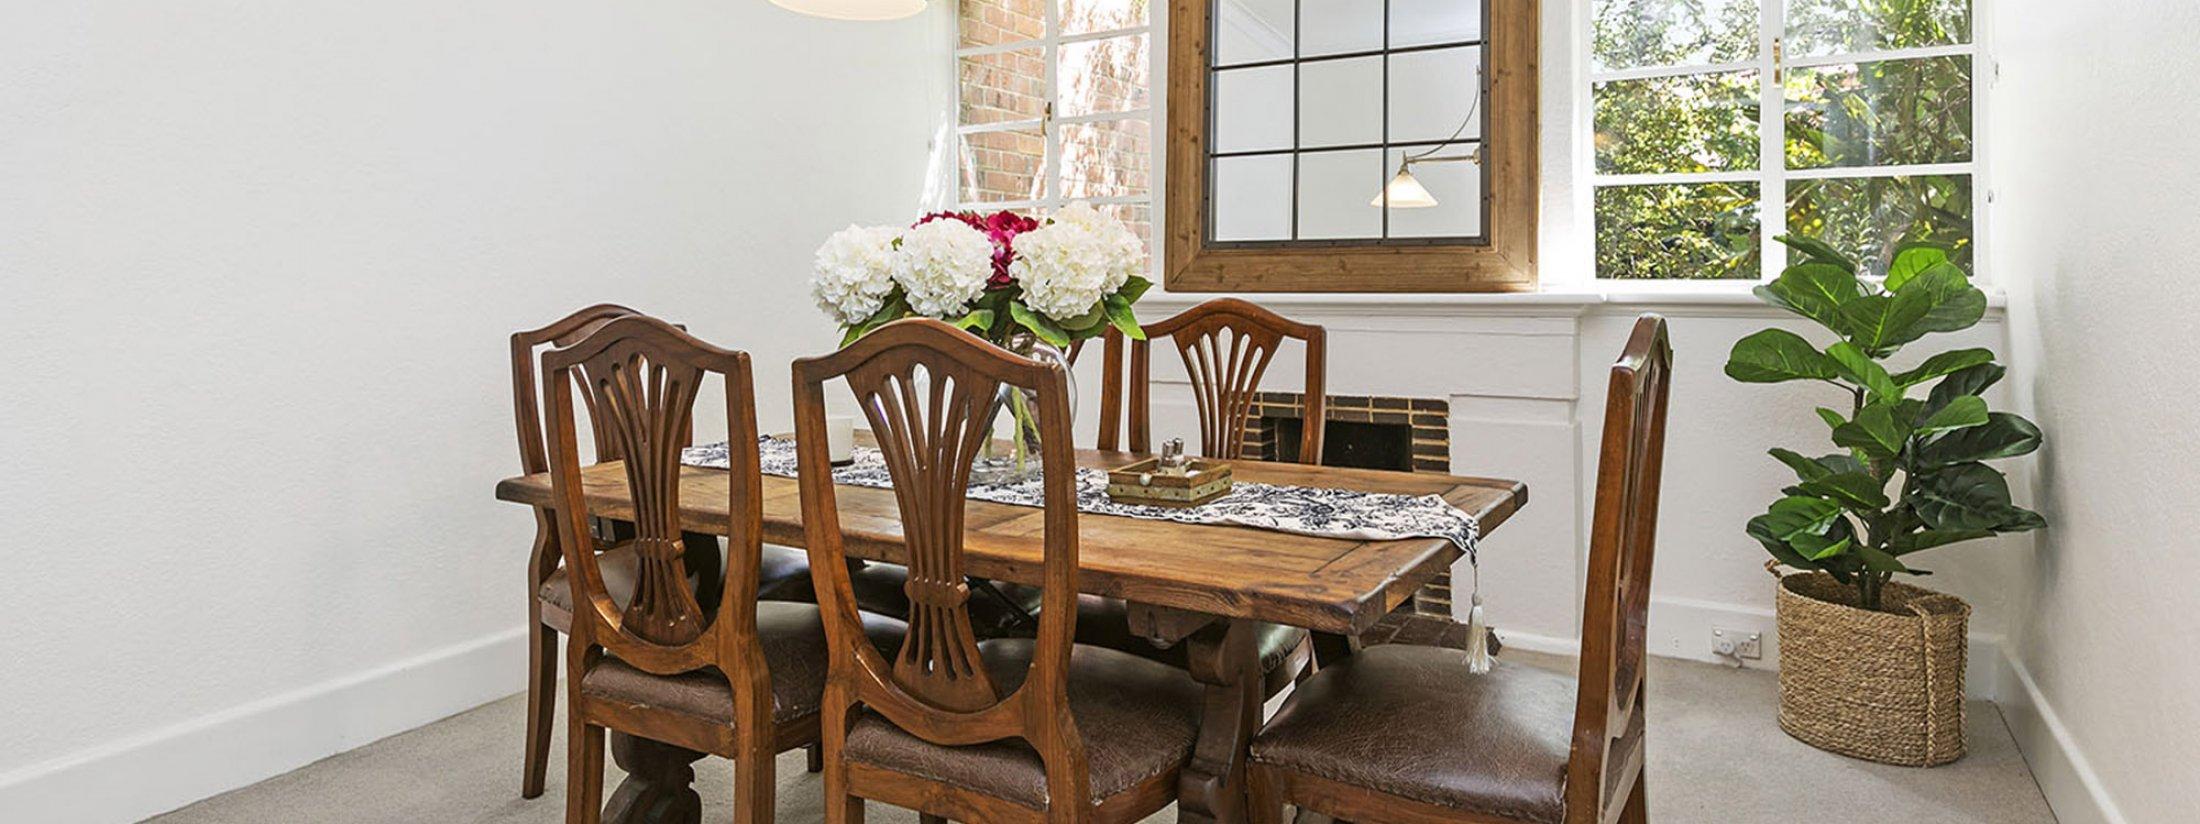 Frankies Place - Malvern - Dining Area